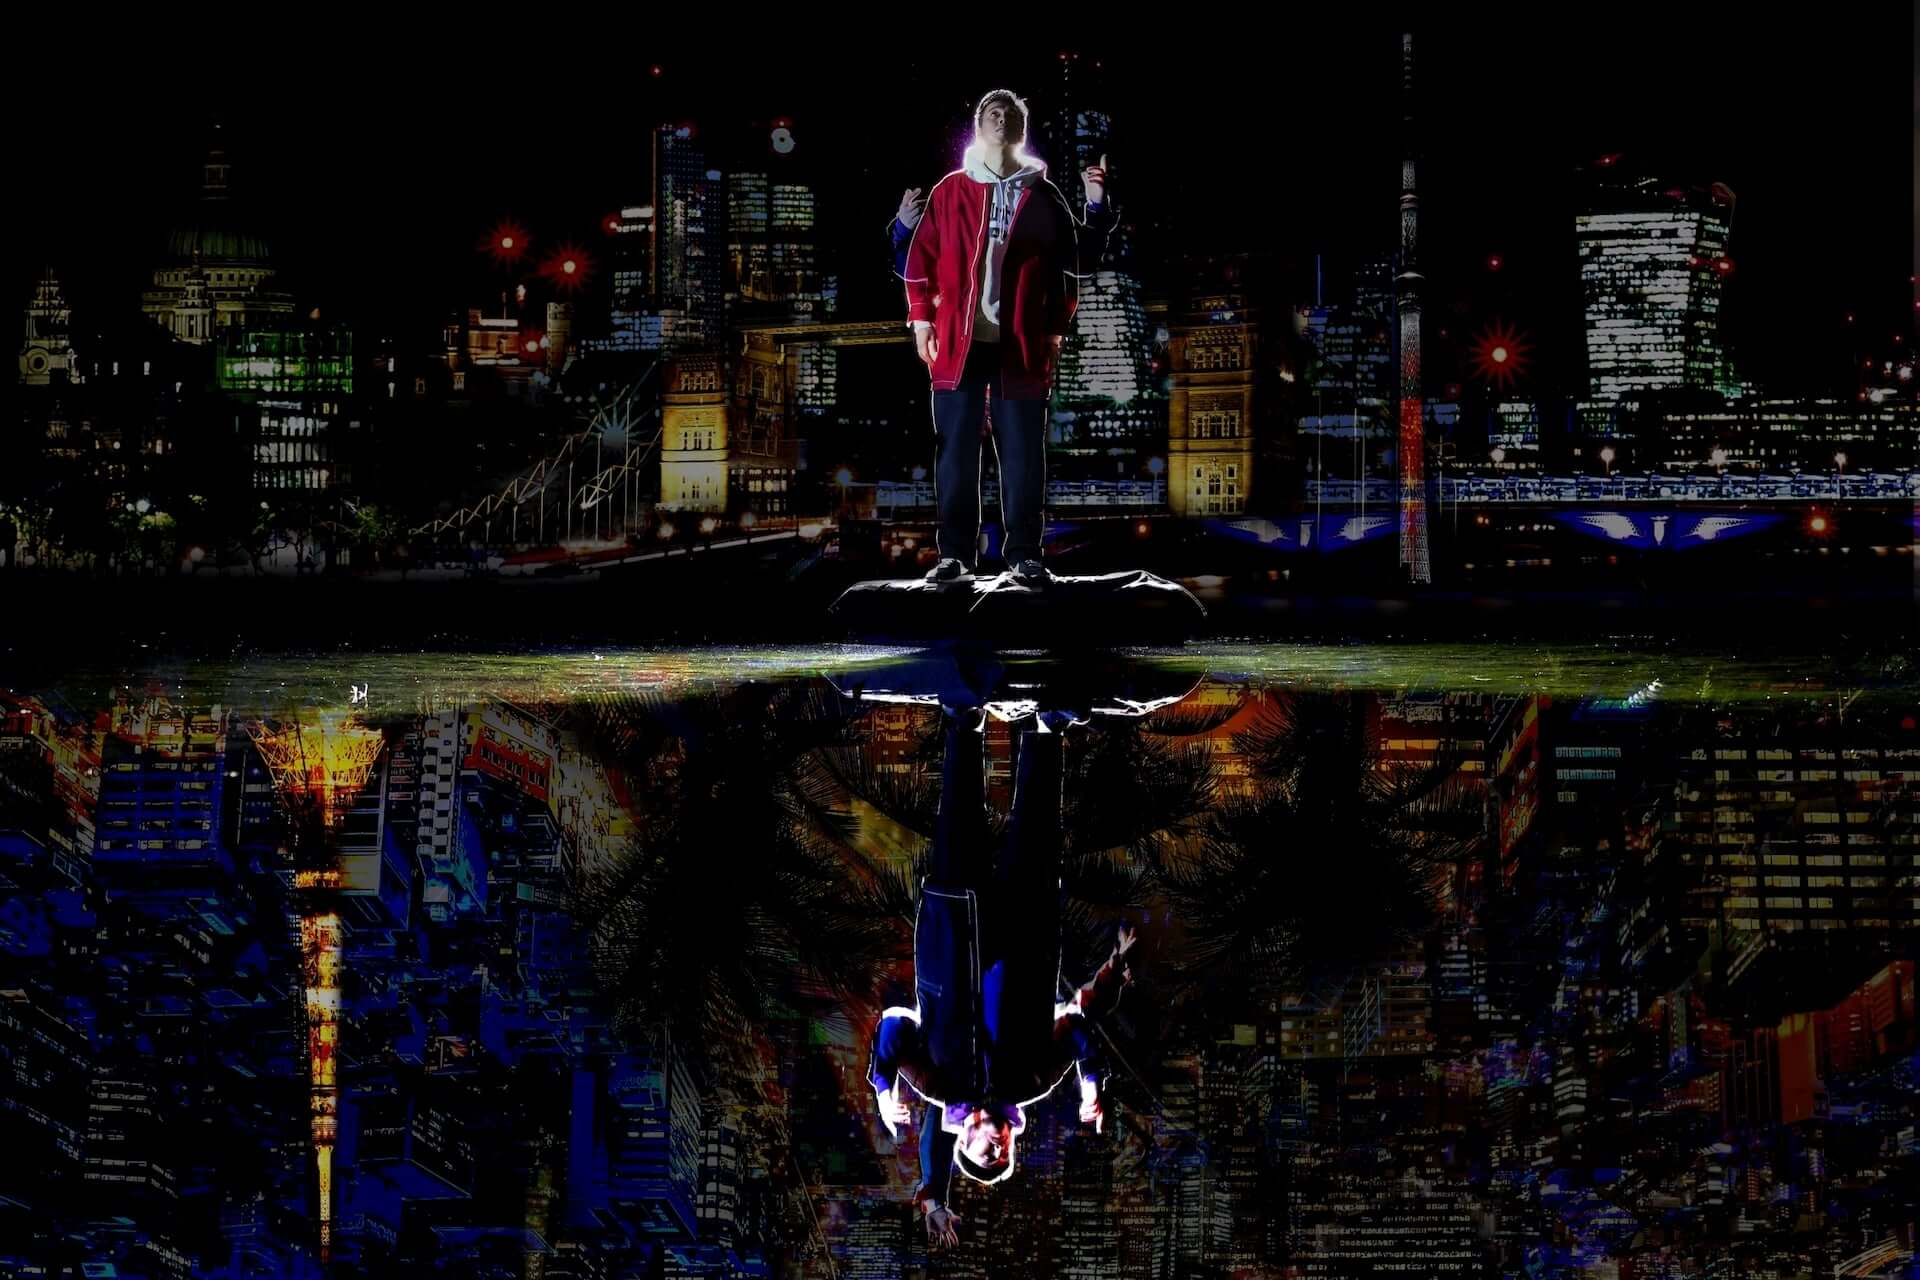 sankaraの新EPから先行シングル「Elevator」が配信開始!内田理央が出演するChilly Source監督のMVも公開 music200225_sankara_2-1920x1280